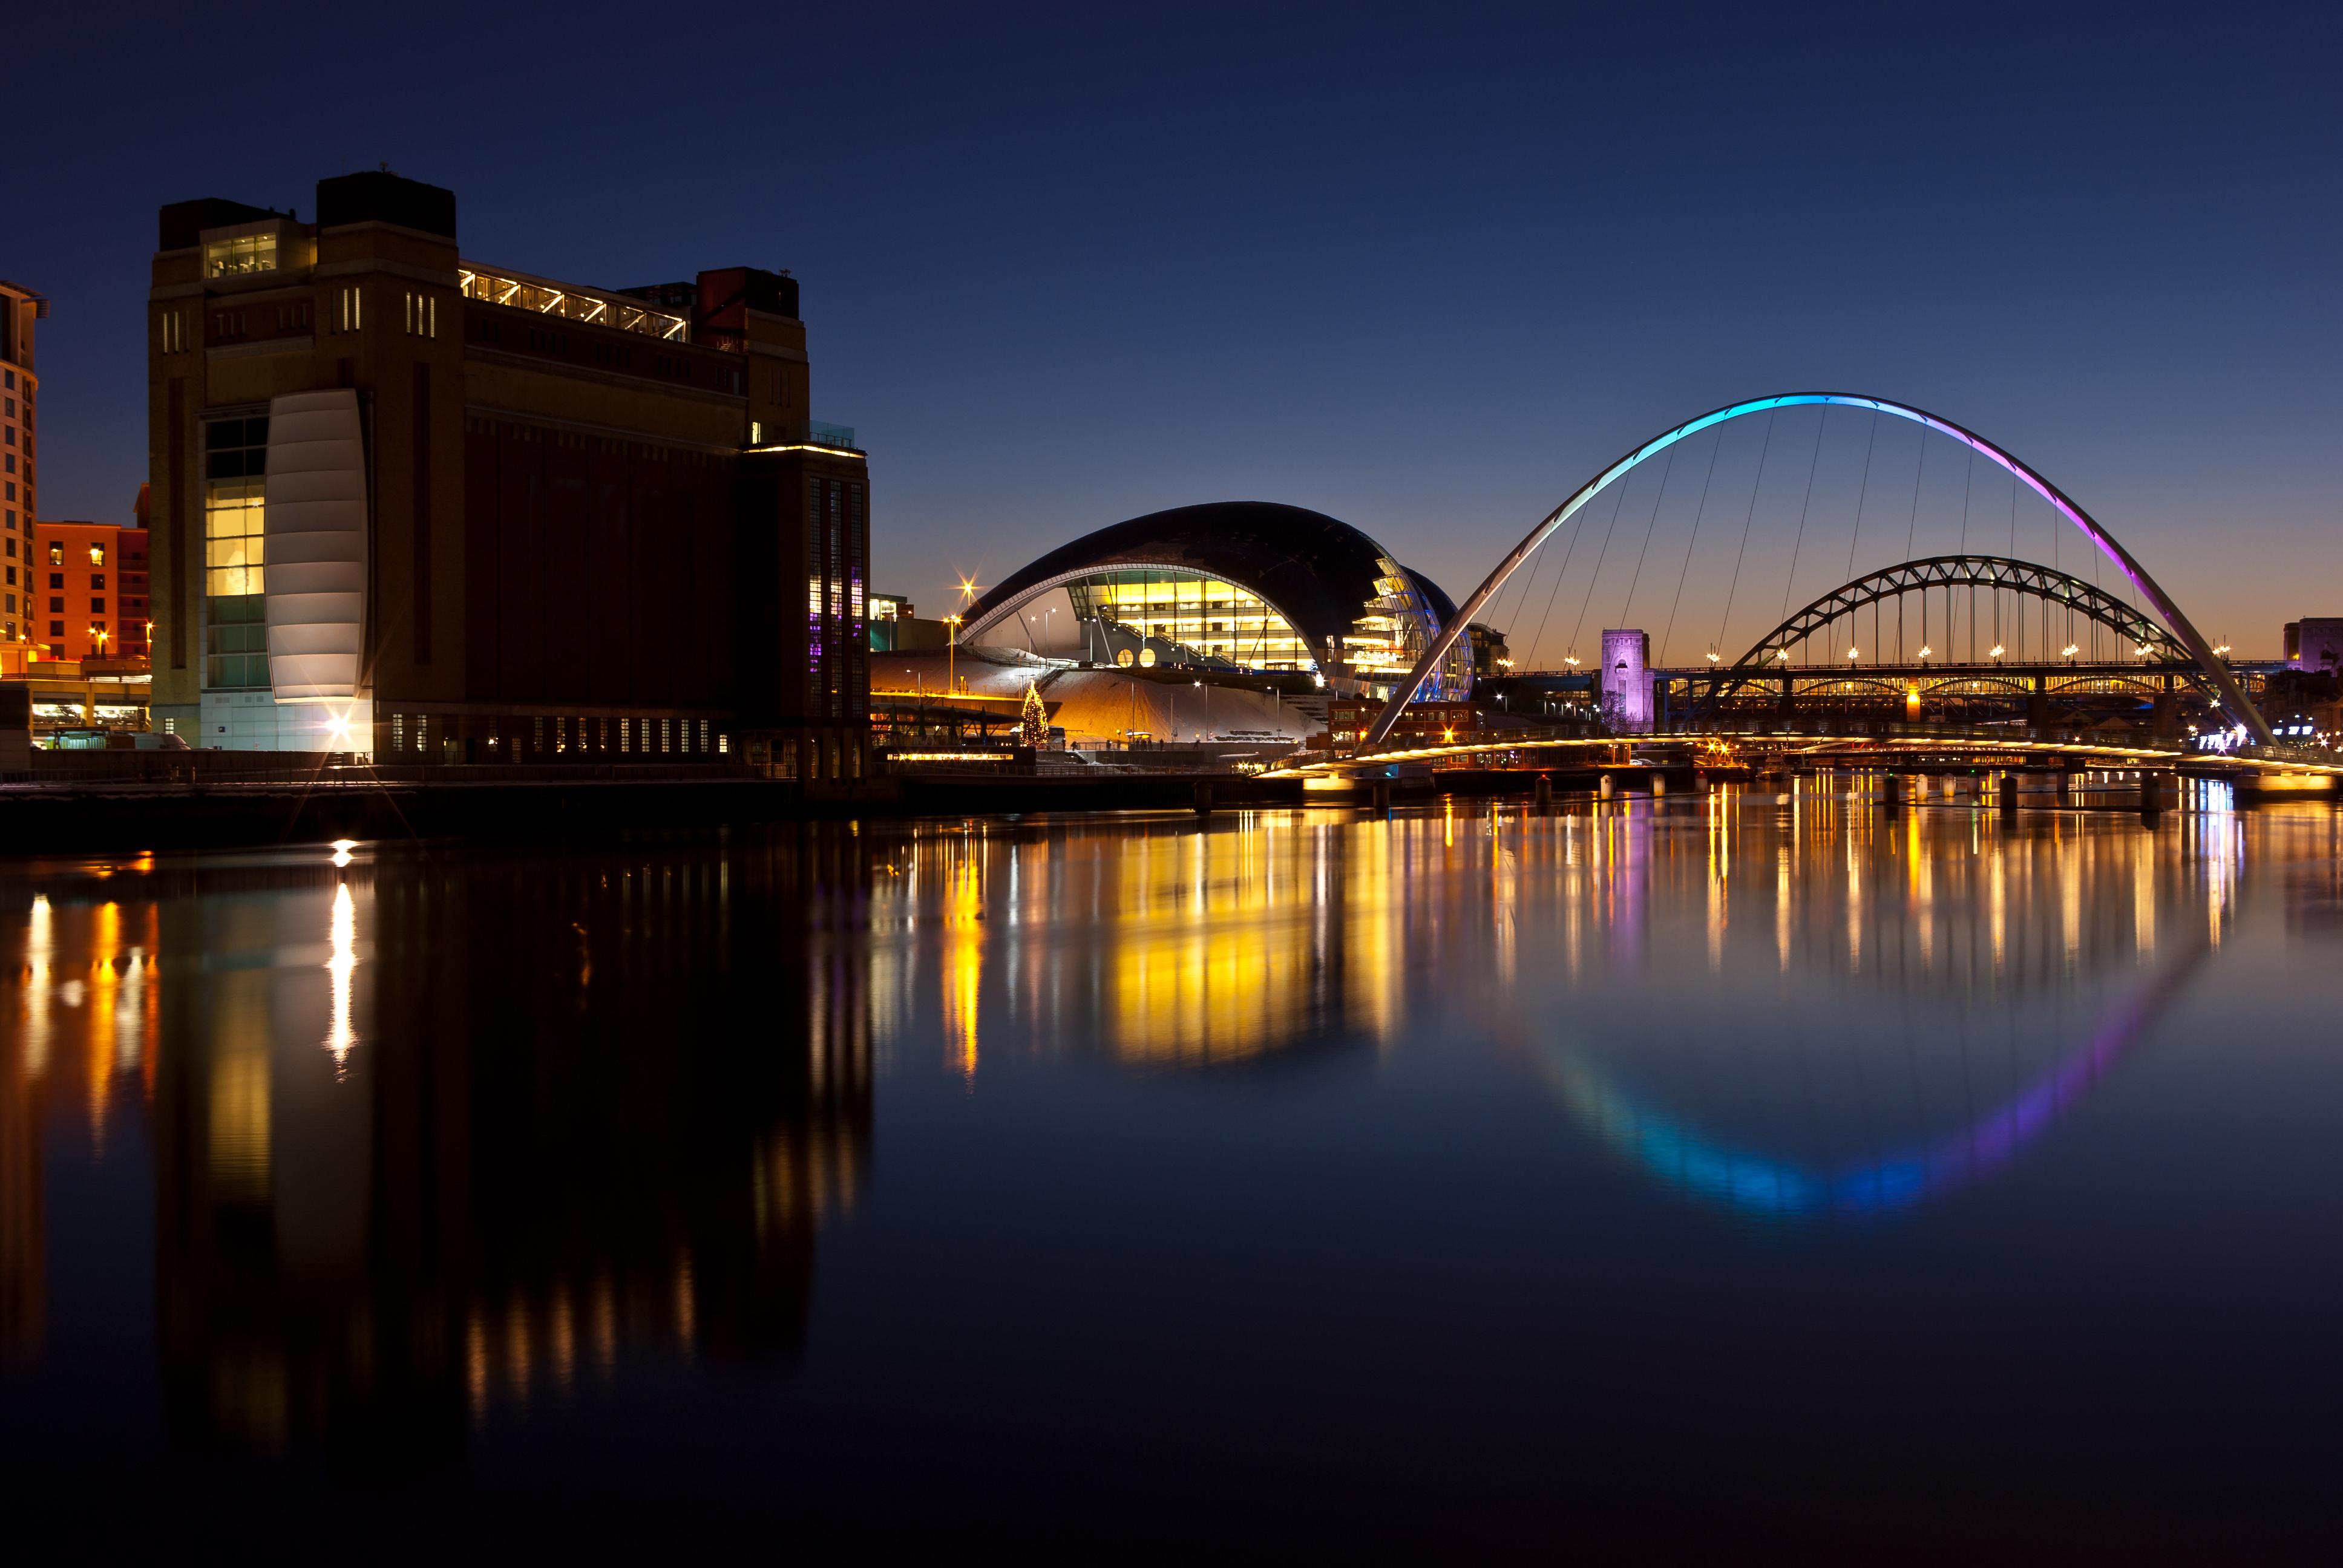 Newcastle and Gateshead at sundown showing Gateshead Millenium Bridge and Tyne Bridges